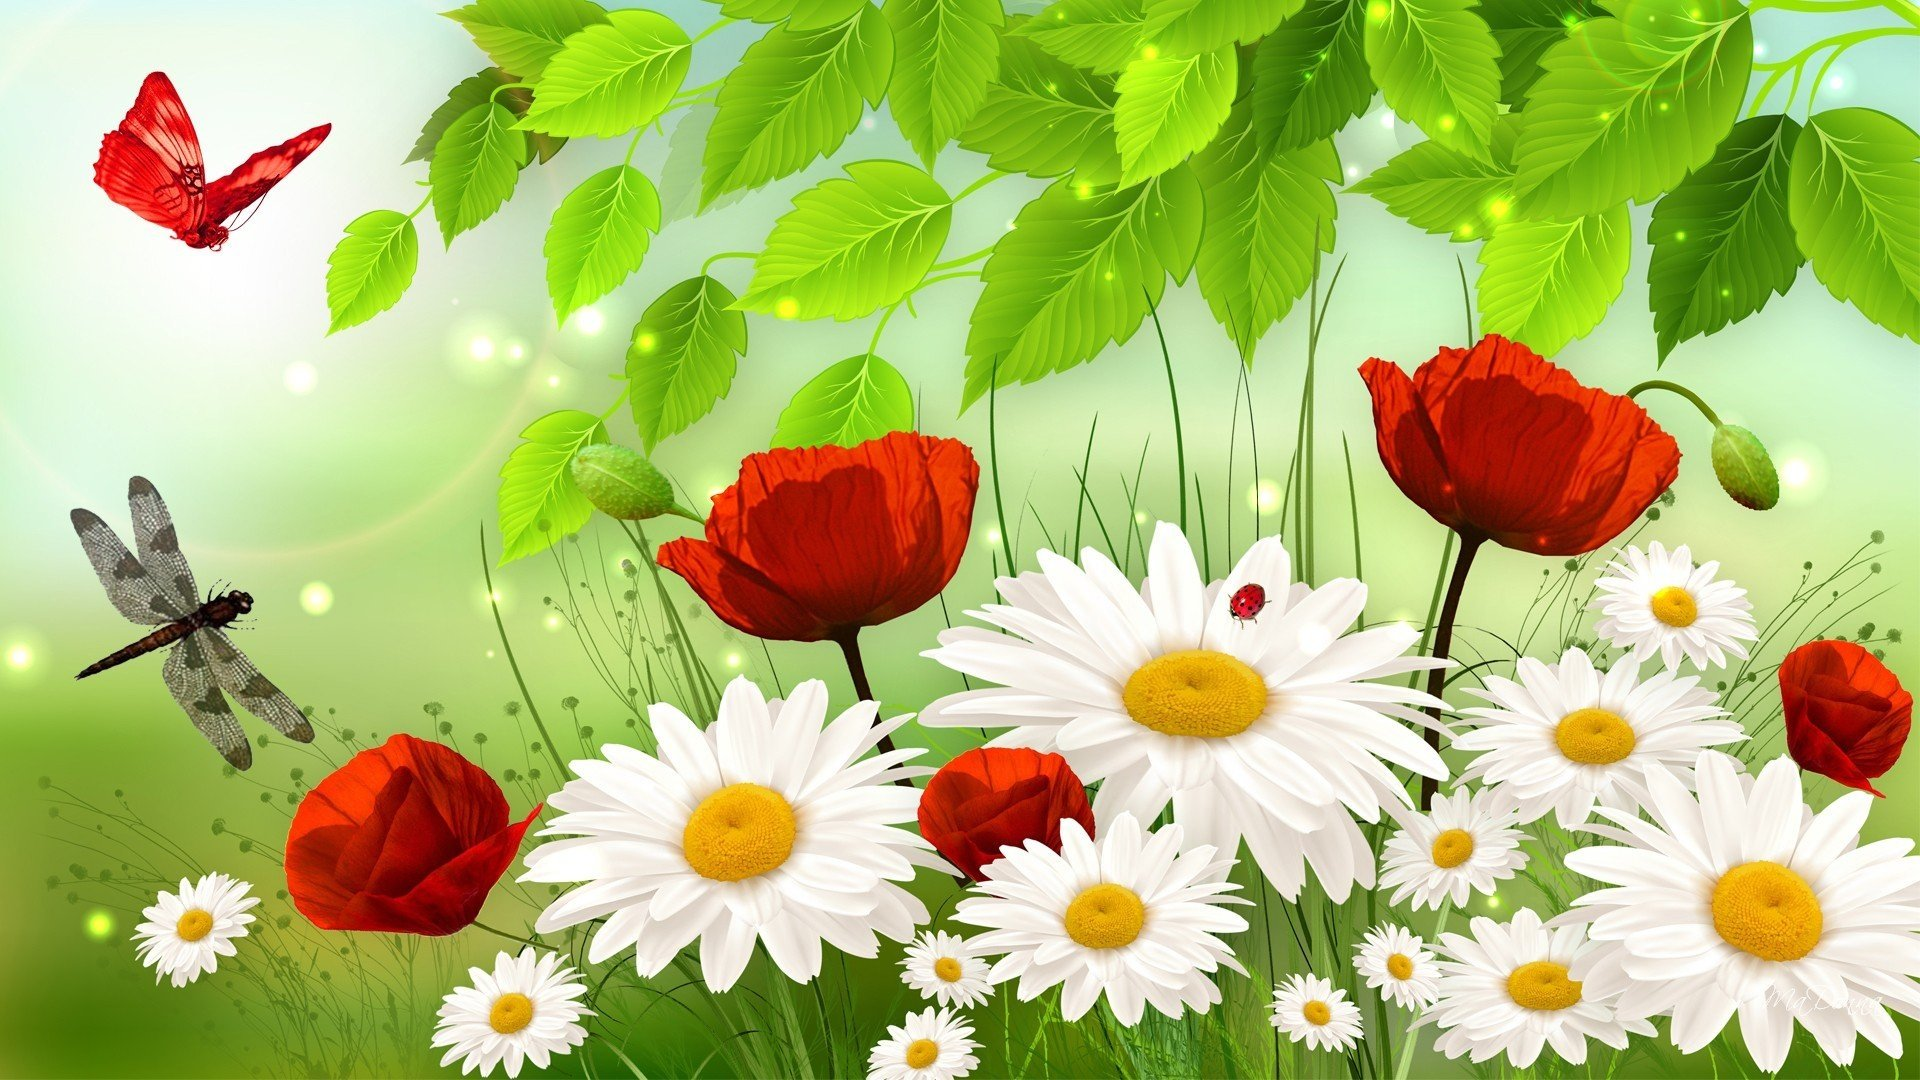 Springtime full hd fond d 39 cran and arri re plan for Fond ecran gratuit ete